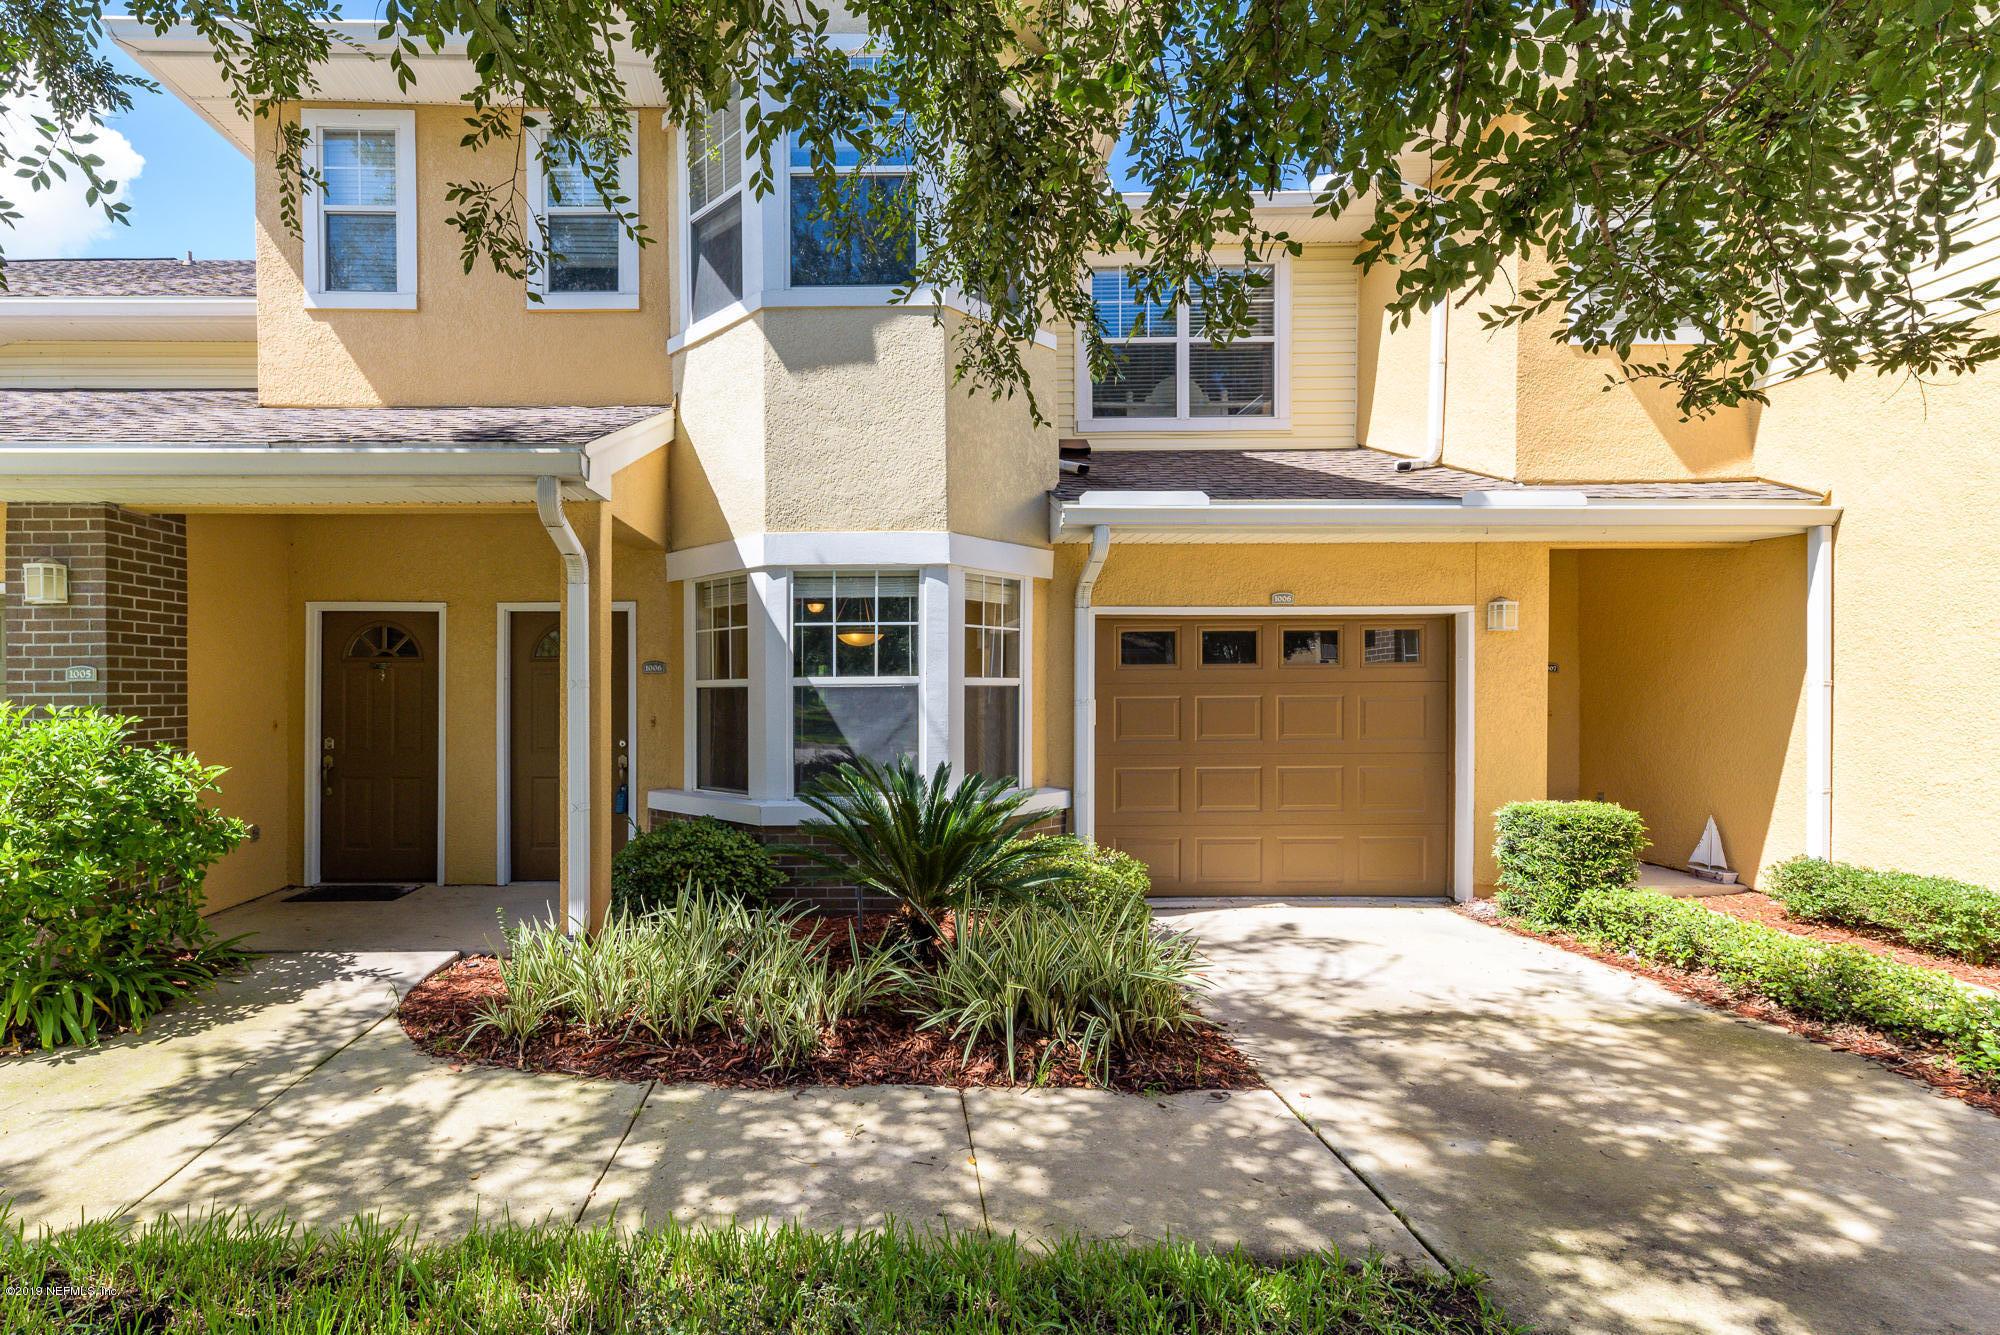 5663 GREENLAND, JACKSONVILLE, FLORIDA 32258, 2 Bedrooms Bedrooms, ,2 BathroomsBathrooms,Condo,For sale,GREENLAND,1012856